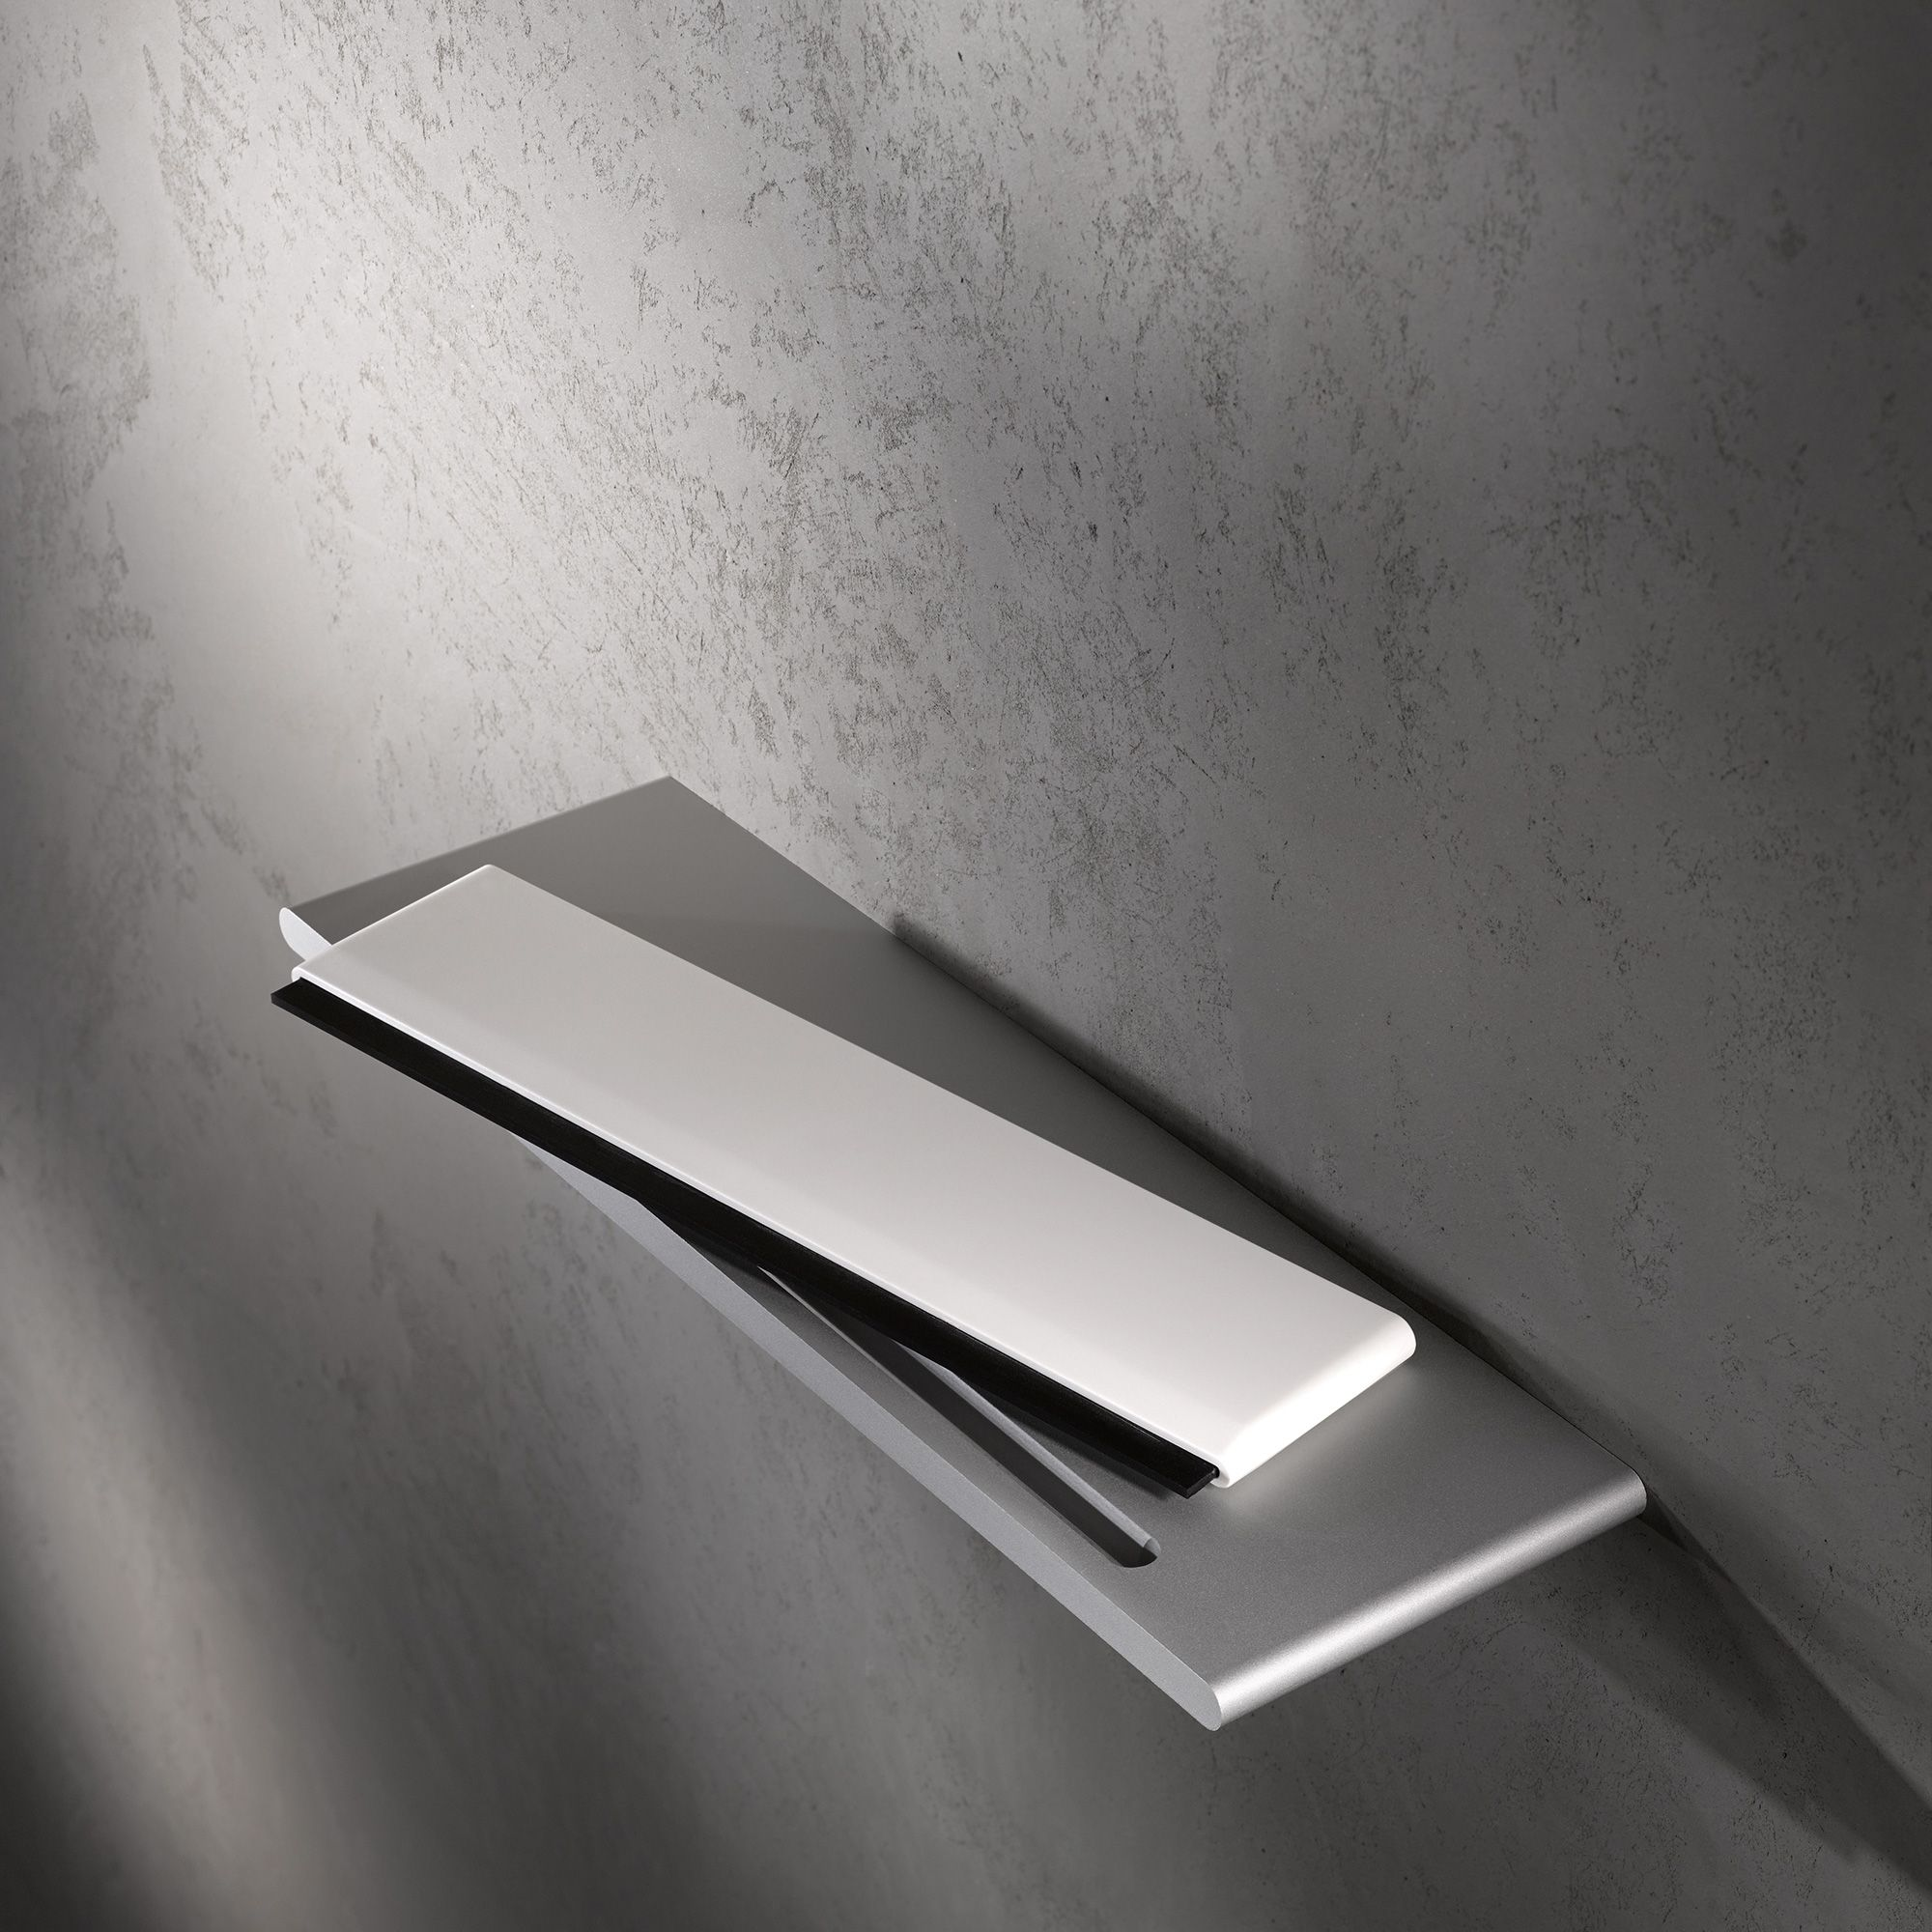 keuco edition 400 duschablage mit glasabzieher 328 mm 11559170000 baths spa. Black Bedroom Furniture Sets. Home Design Ideas